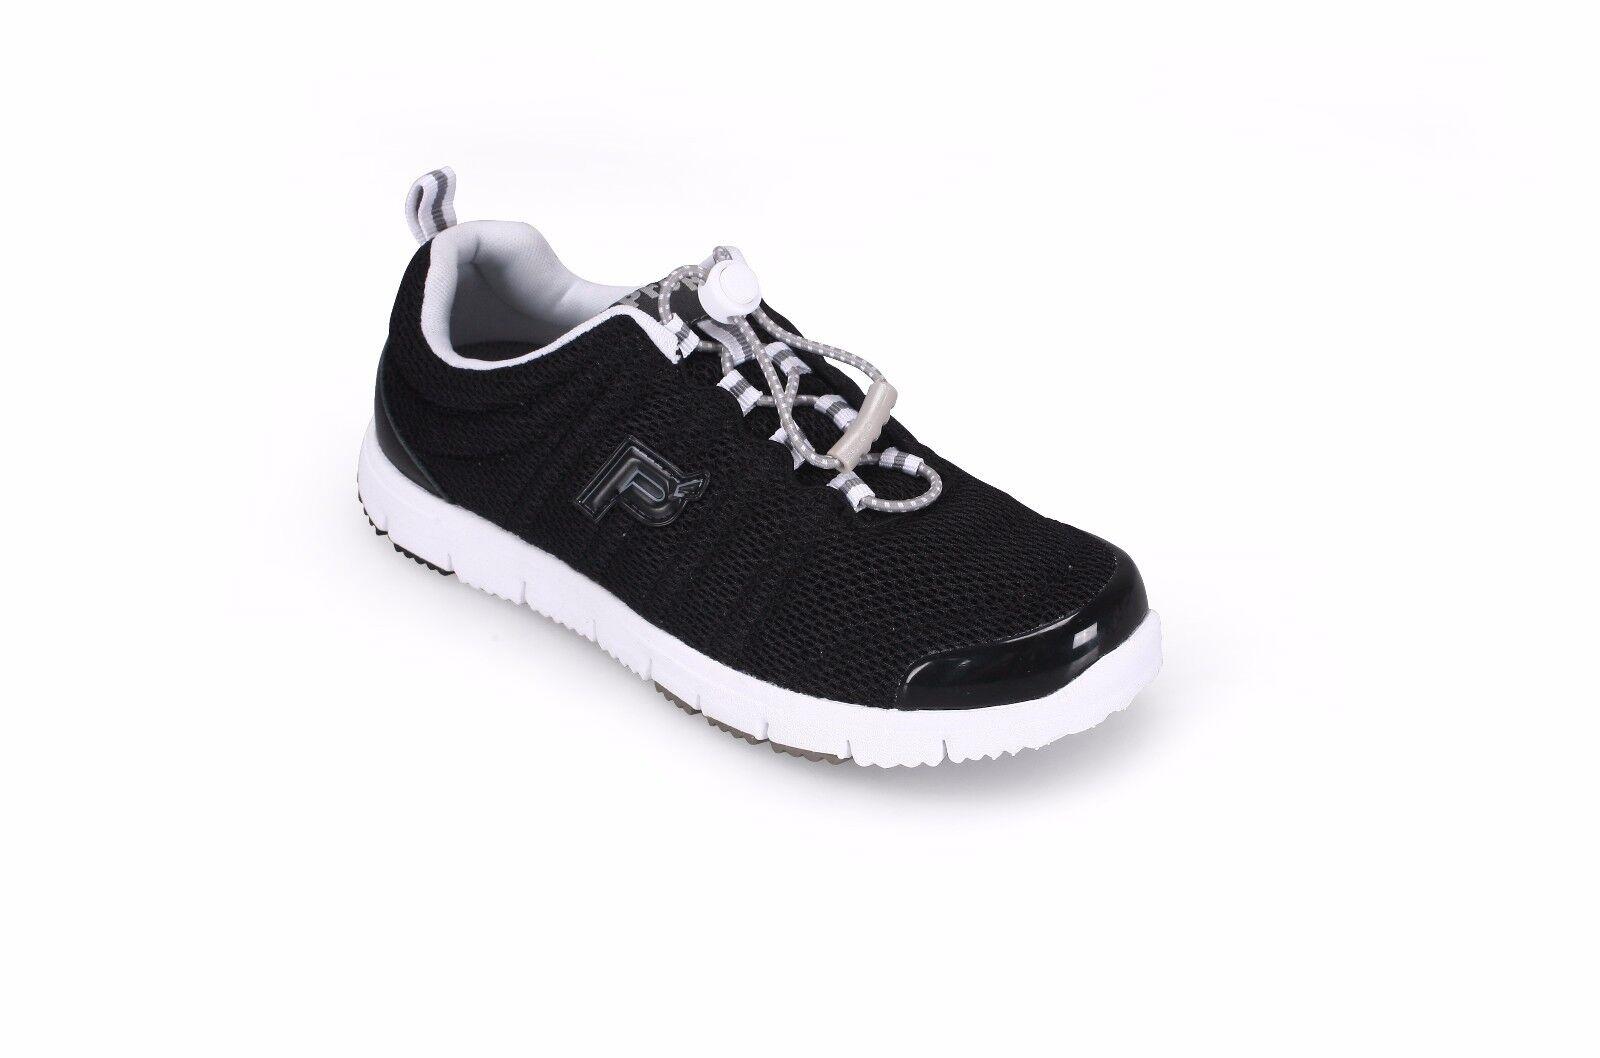 Propet Mujeres Viaje Walker Negro II W3239 Negro Walker Zapatillas de peso ligero 00ef07